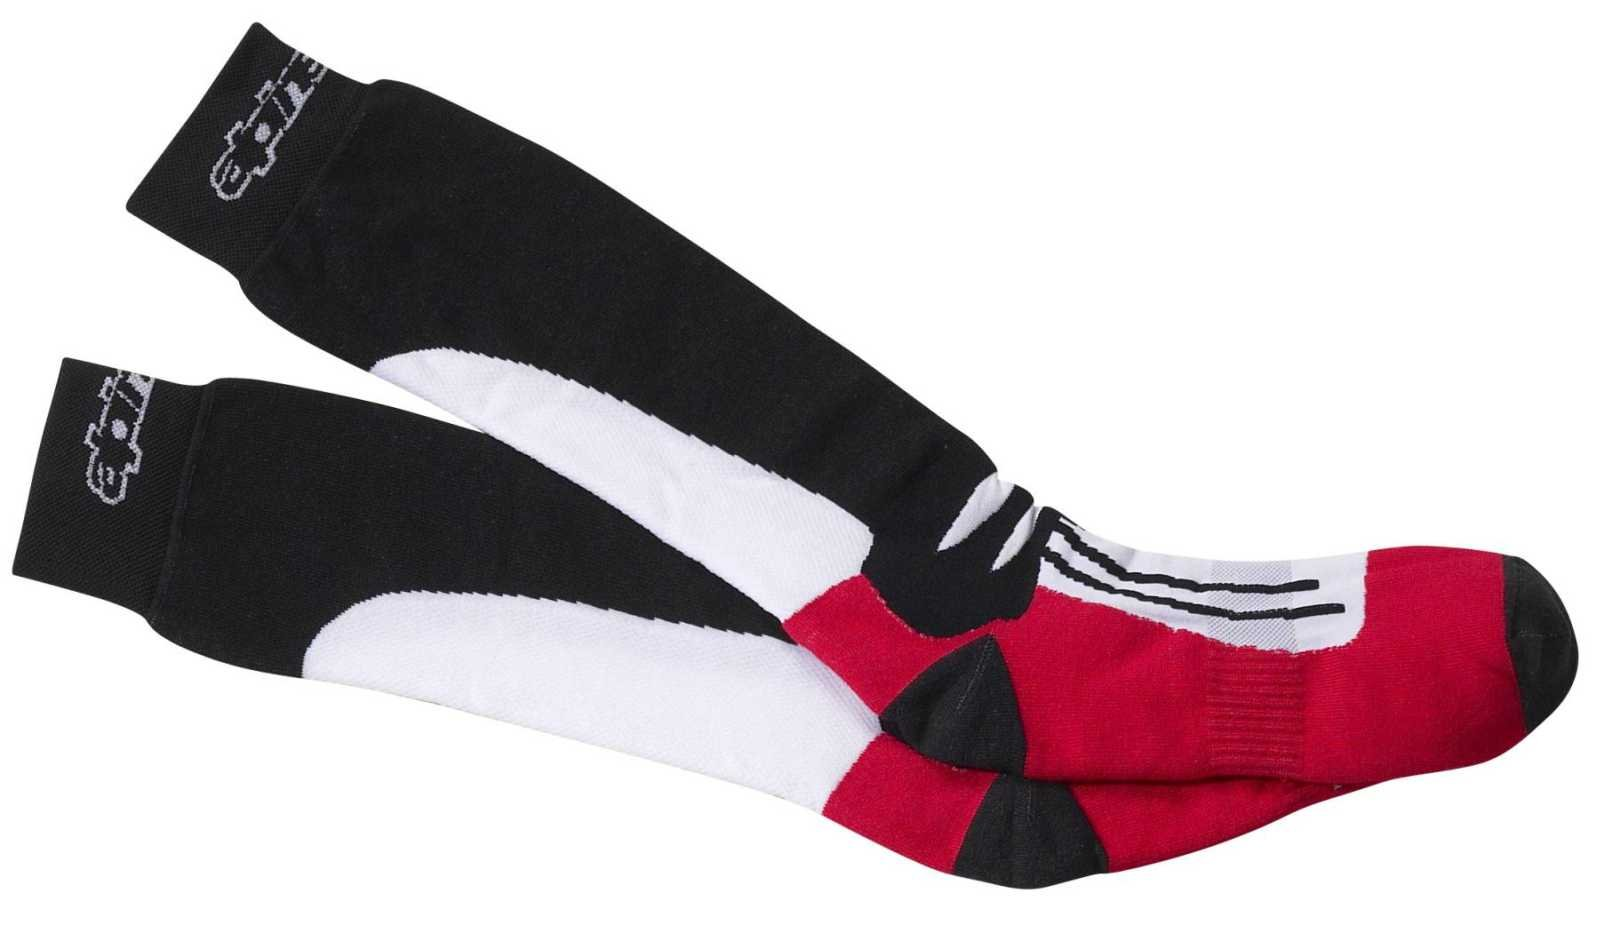 Alpinestars Road Racing Summer Socks , Size: Sm-Md, Gender: Mens/Unisex, Primary Color: White 4703111-30-SM